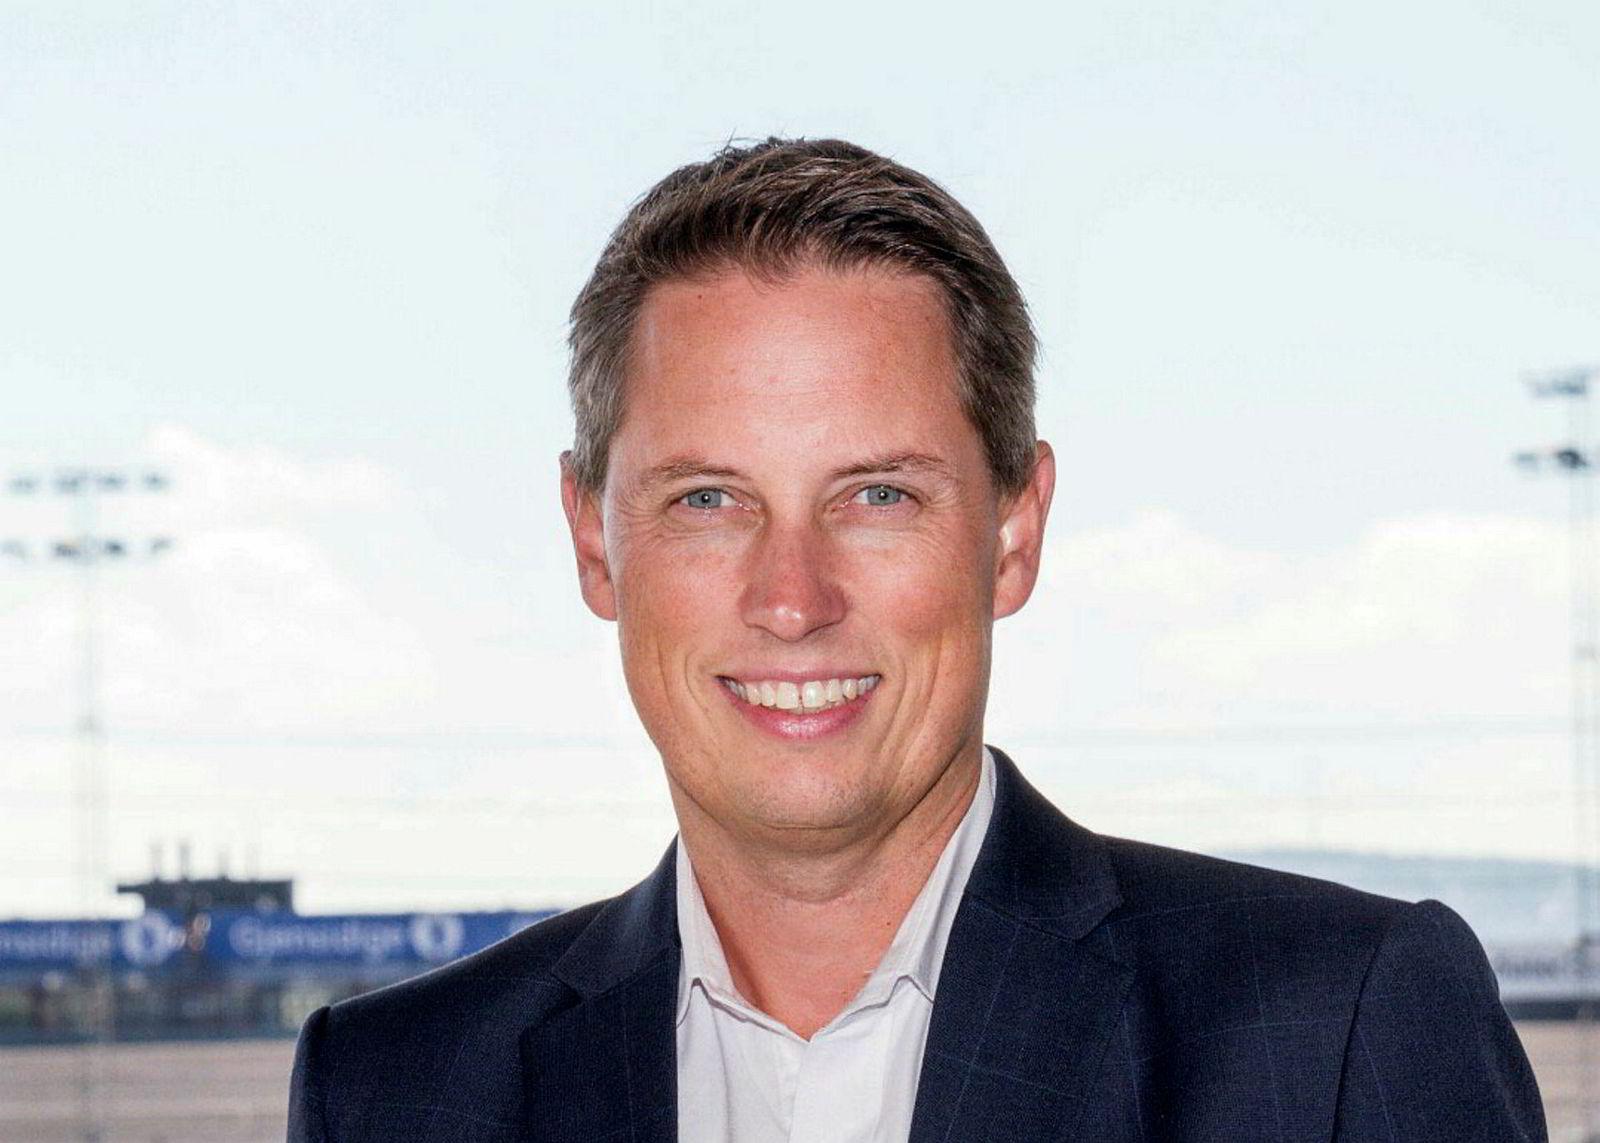 Carl Fredrik Stenstrøm